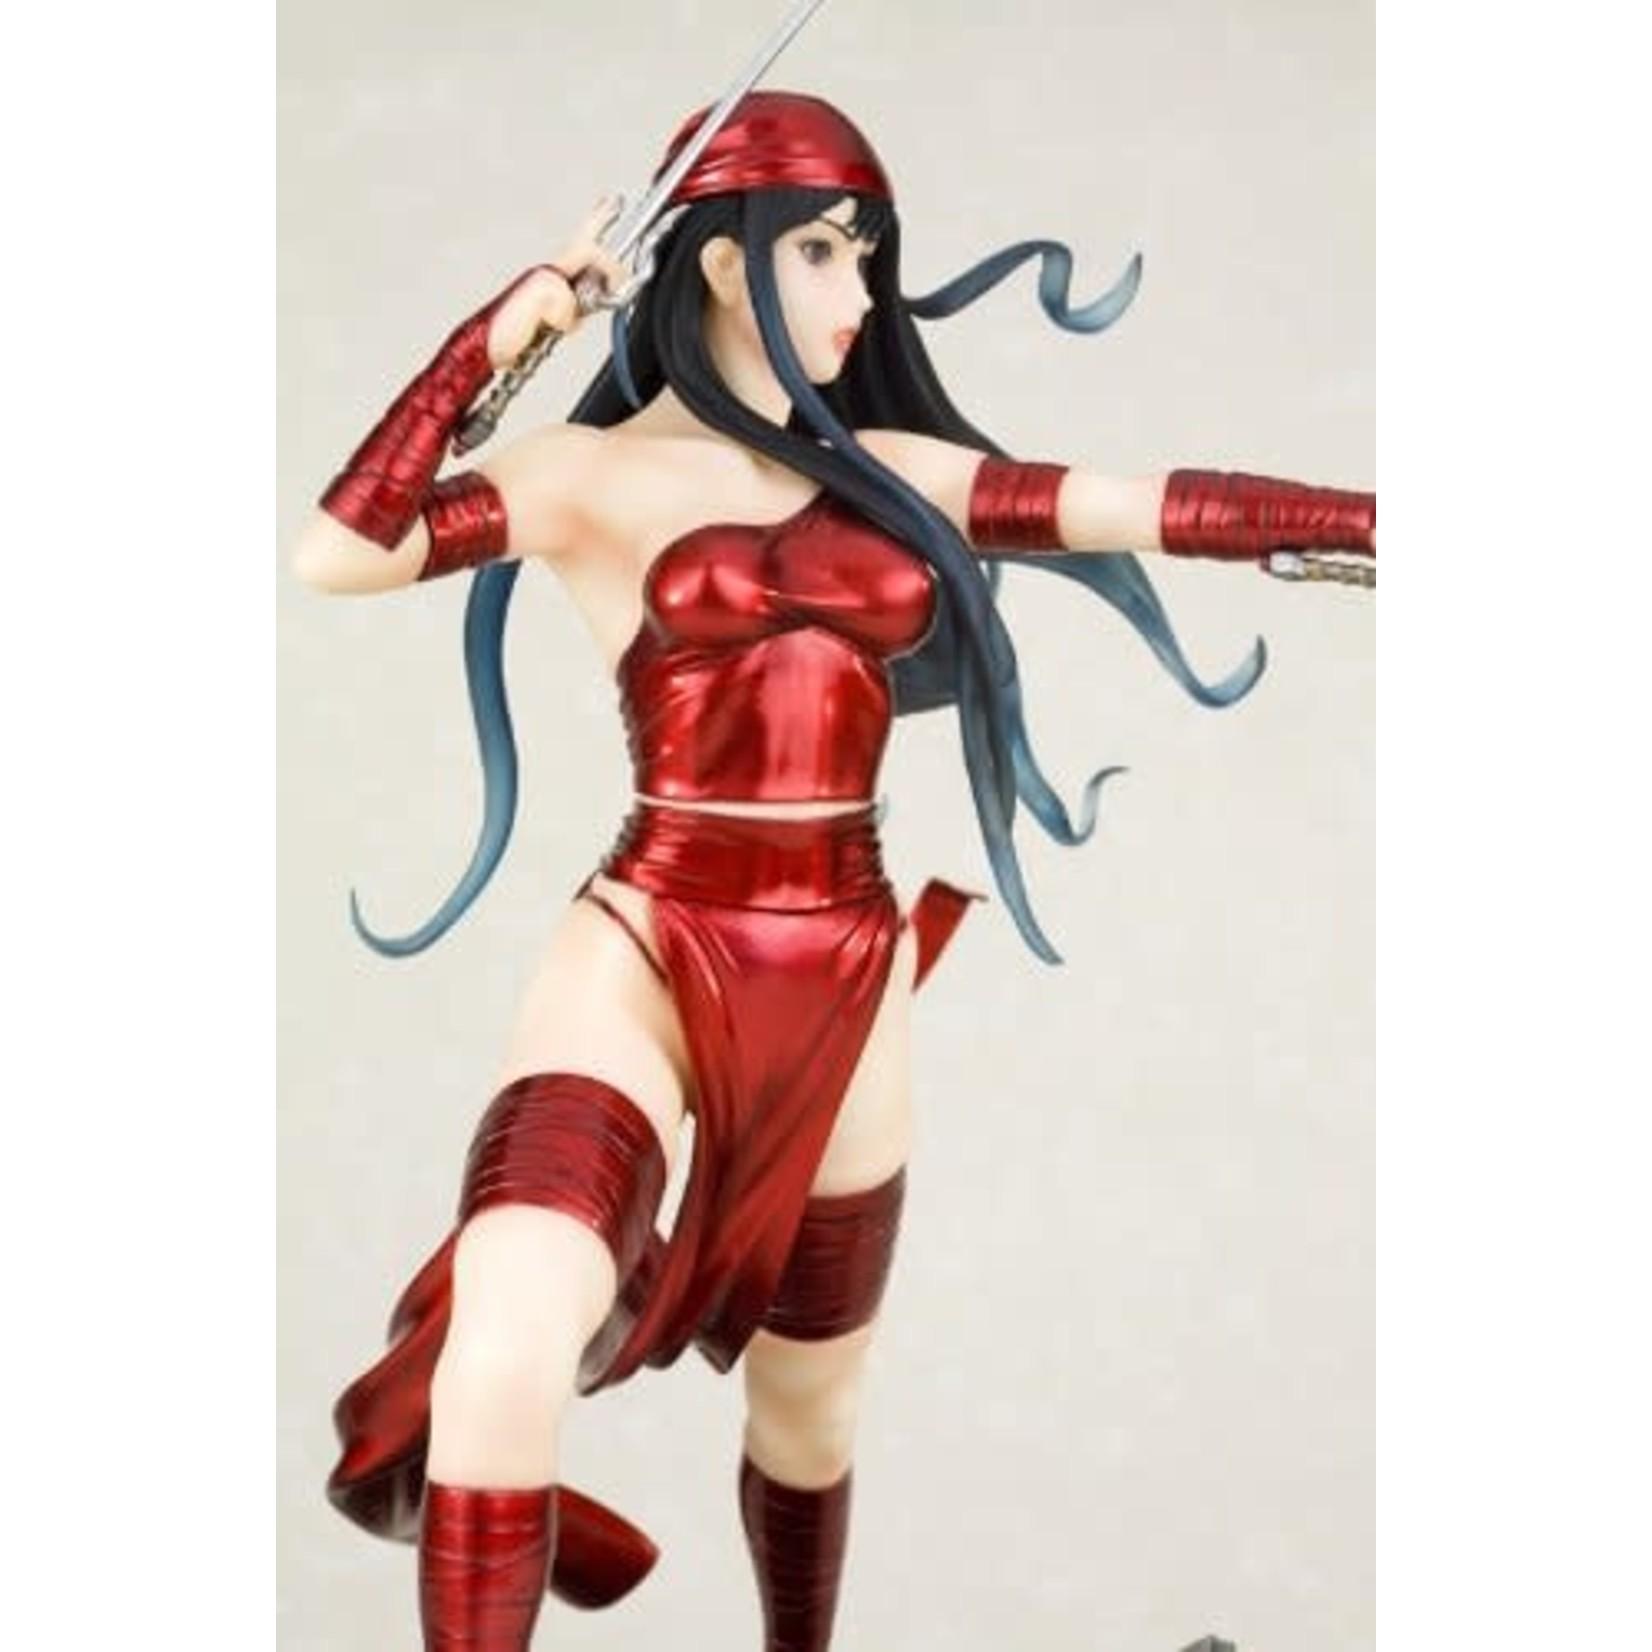 Kotobukiya Daredevil - Elektra - Bishoujo Statue - Marvel x Bishoujo